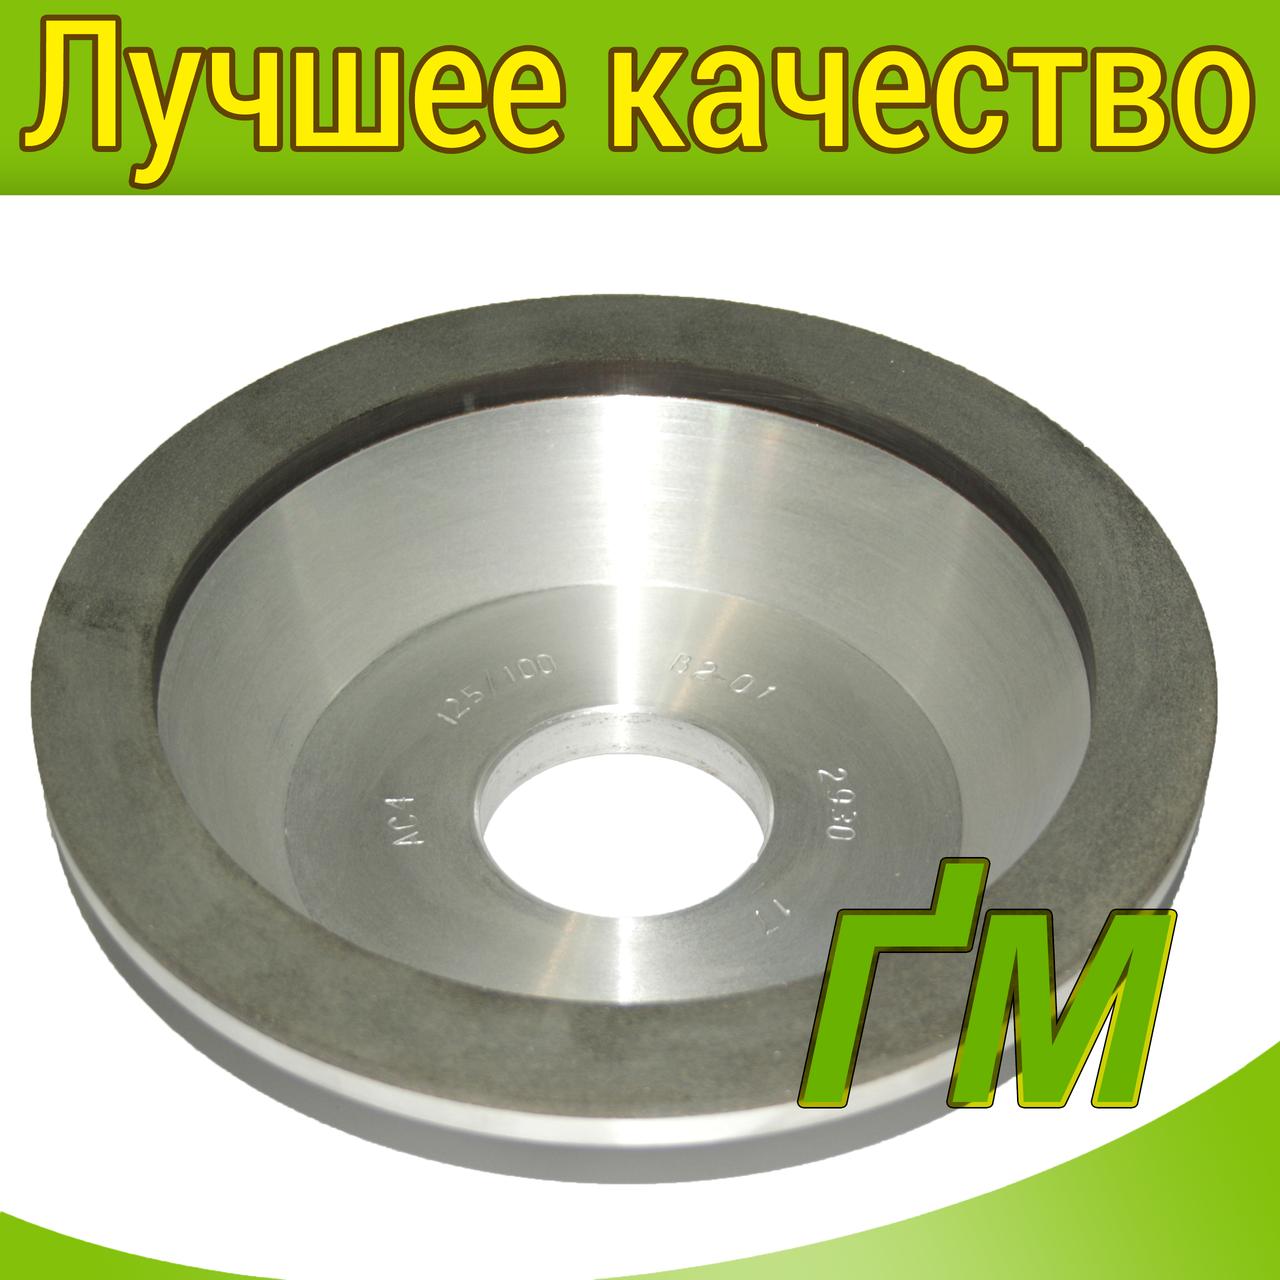 Круг алмазный чашечный конический 12А2-45 Ф 100х5х3х32х20 АСМ 20/14 100% В1